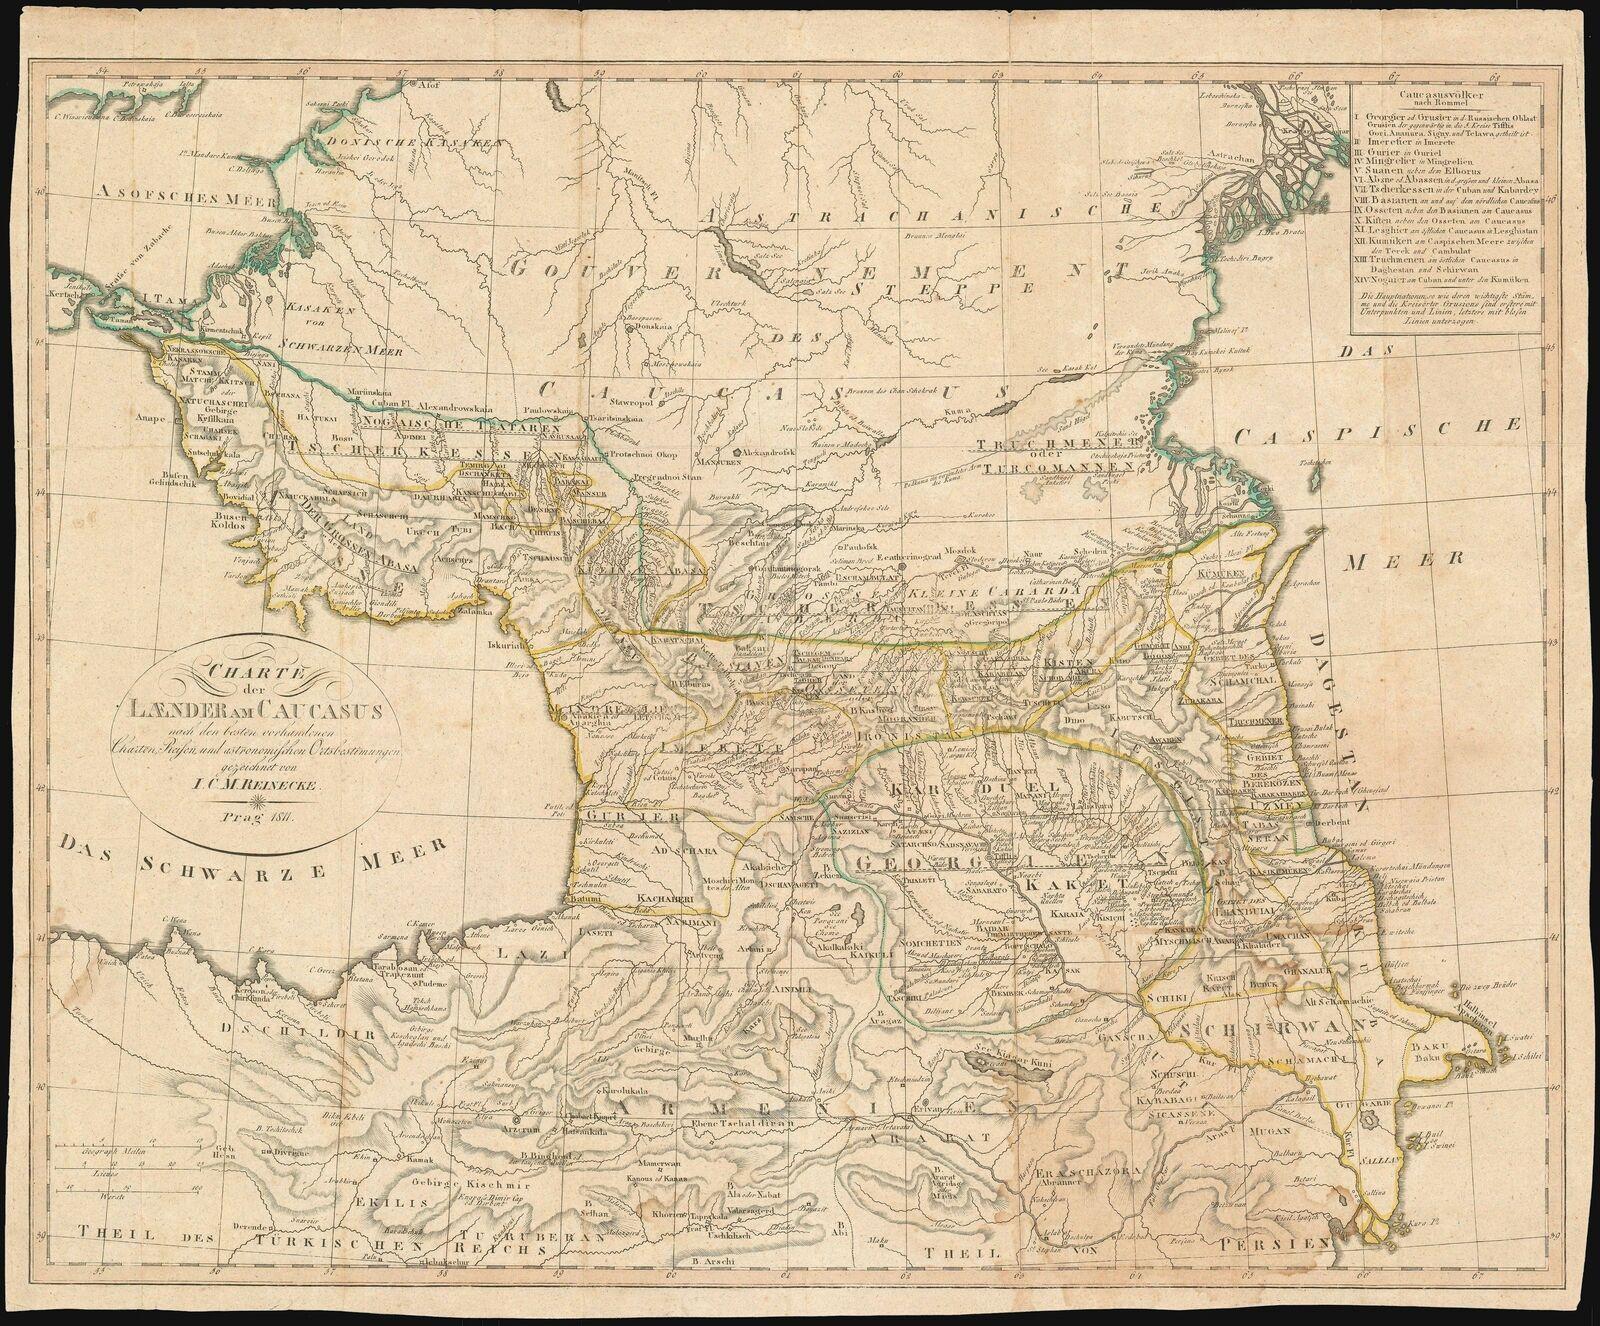 1811 Reinecke Map of the Caucasus Armenia and Georgia